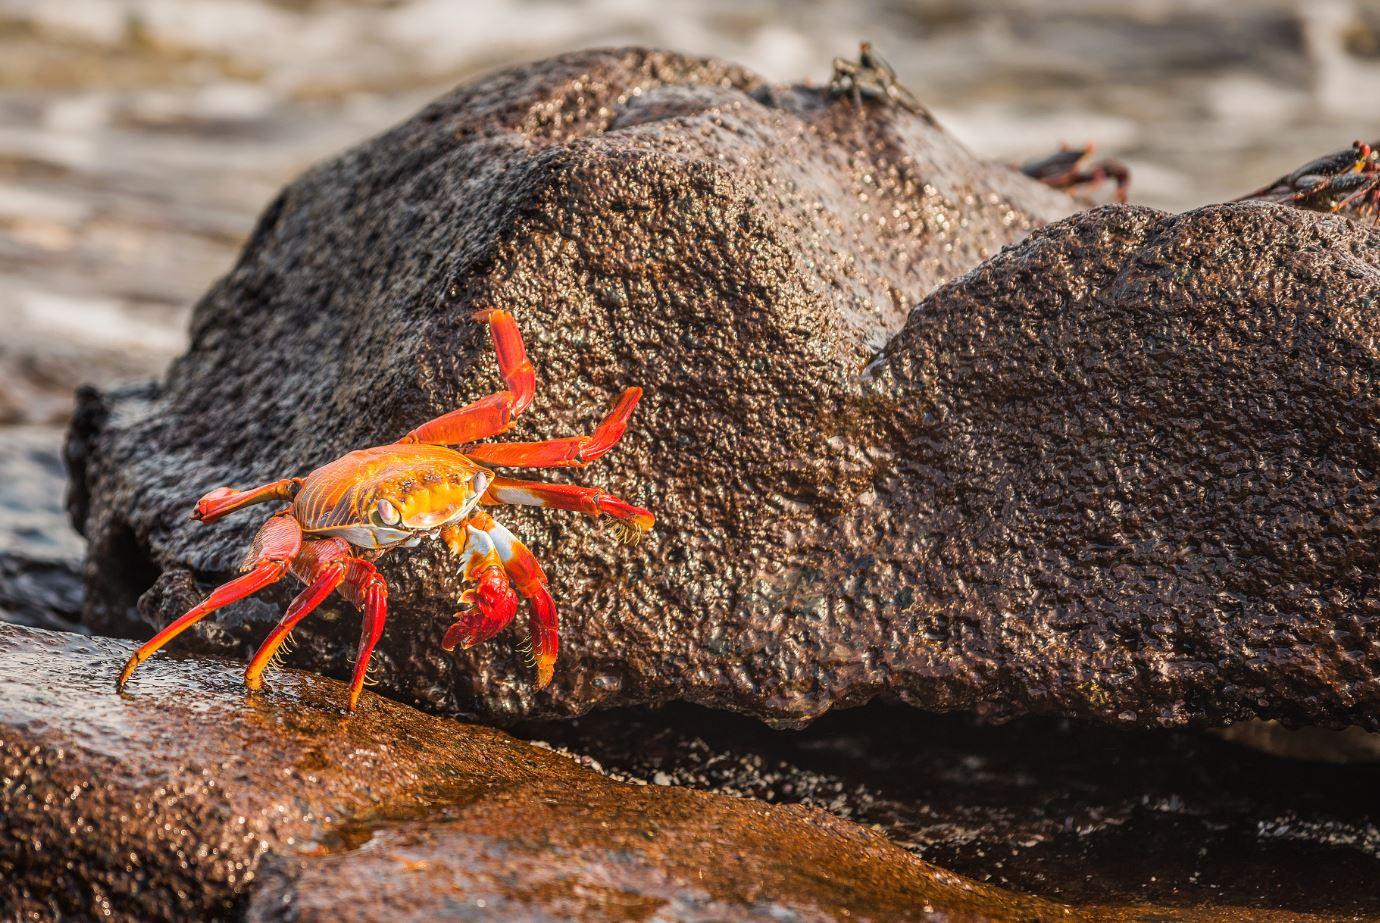 Sally lightfoot crab moving in between rocks.